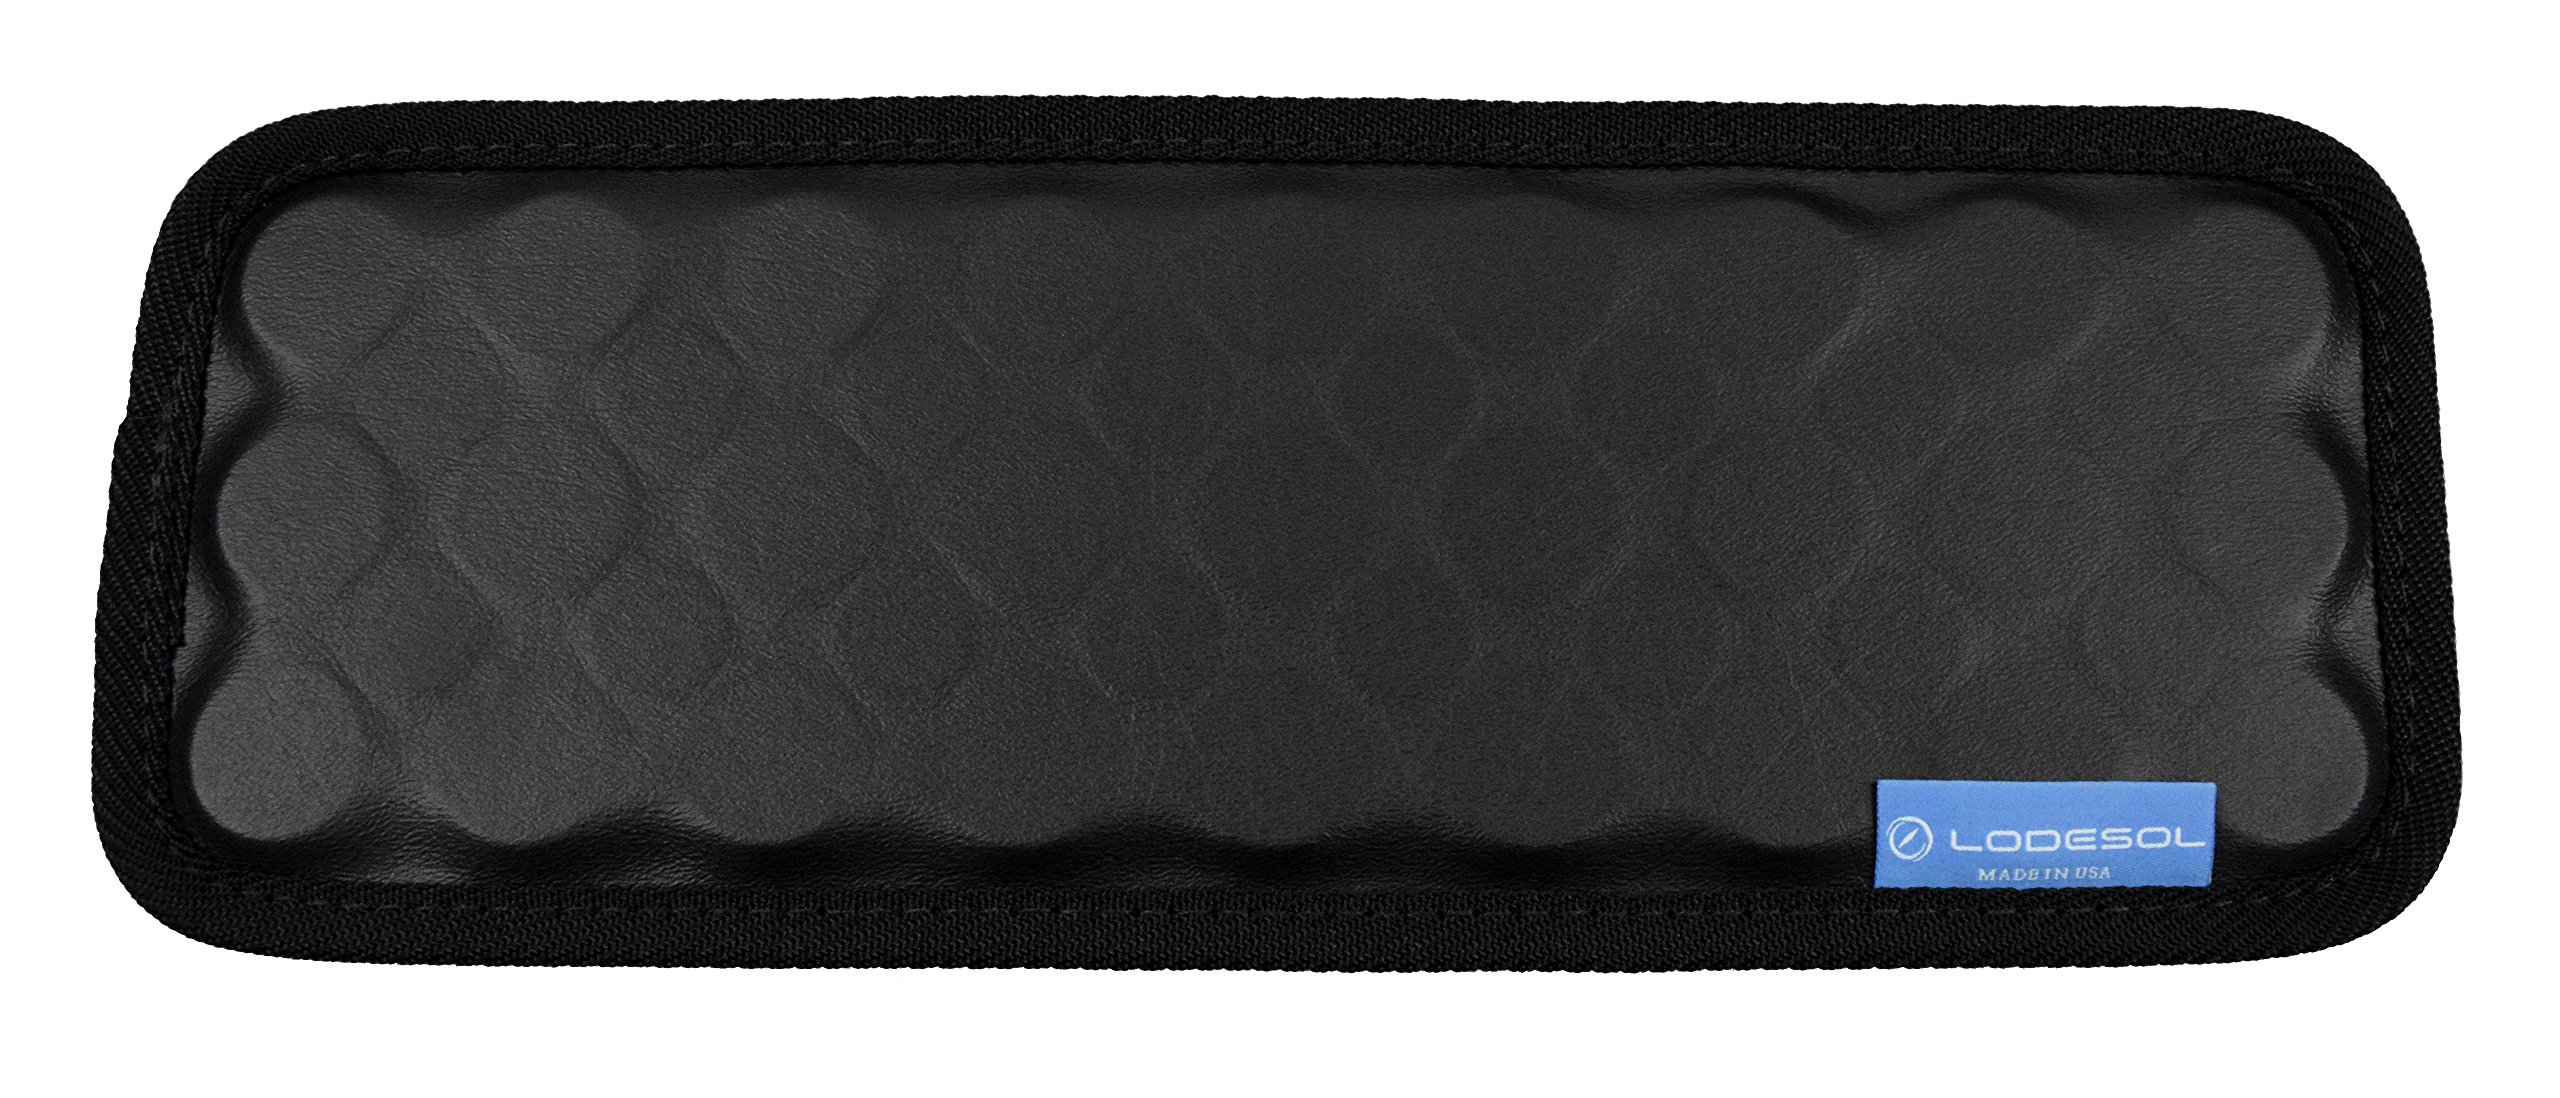 Lodesol Flexible Magnetic Tool Holder 13.875''x5.25'' MP2716